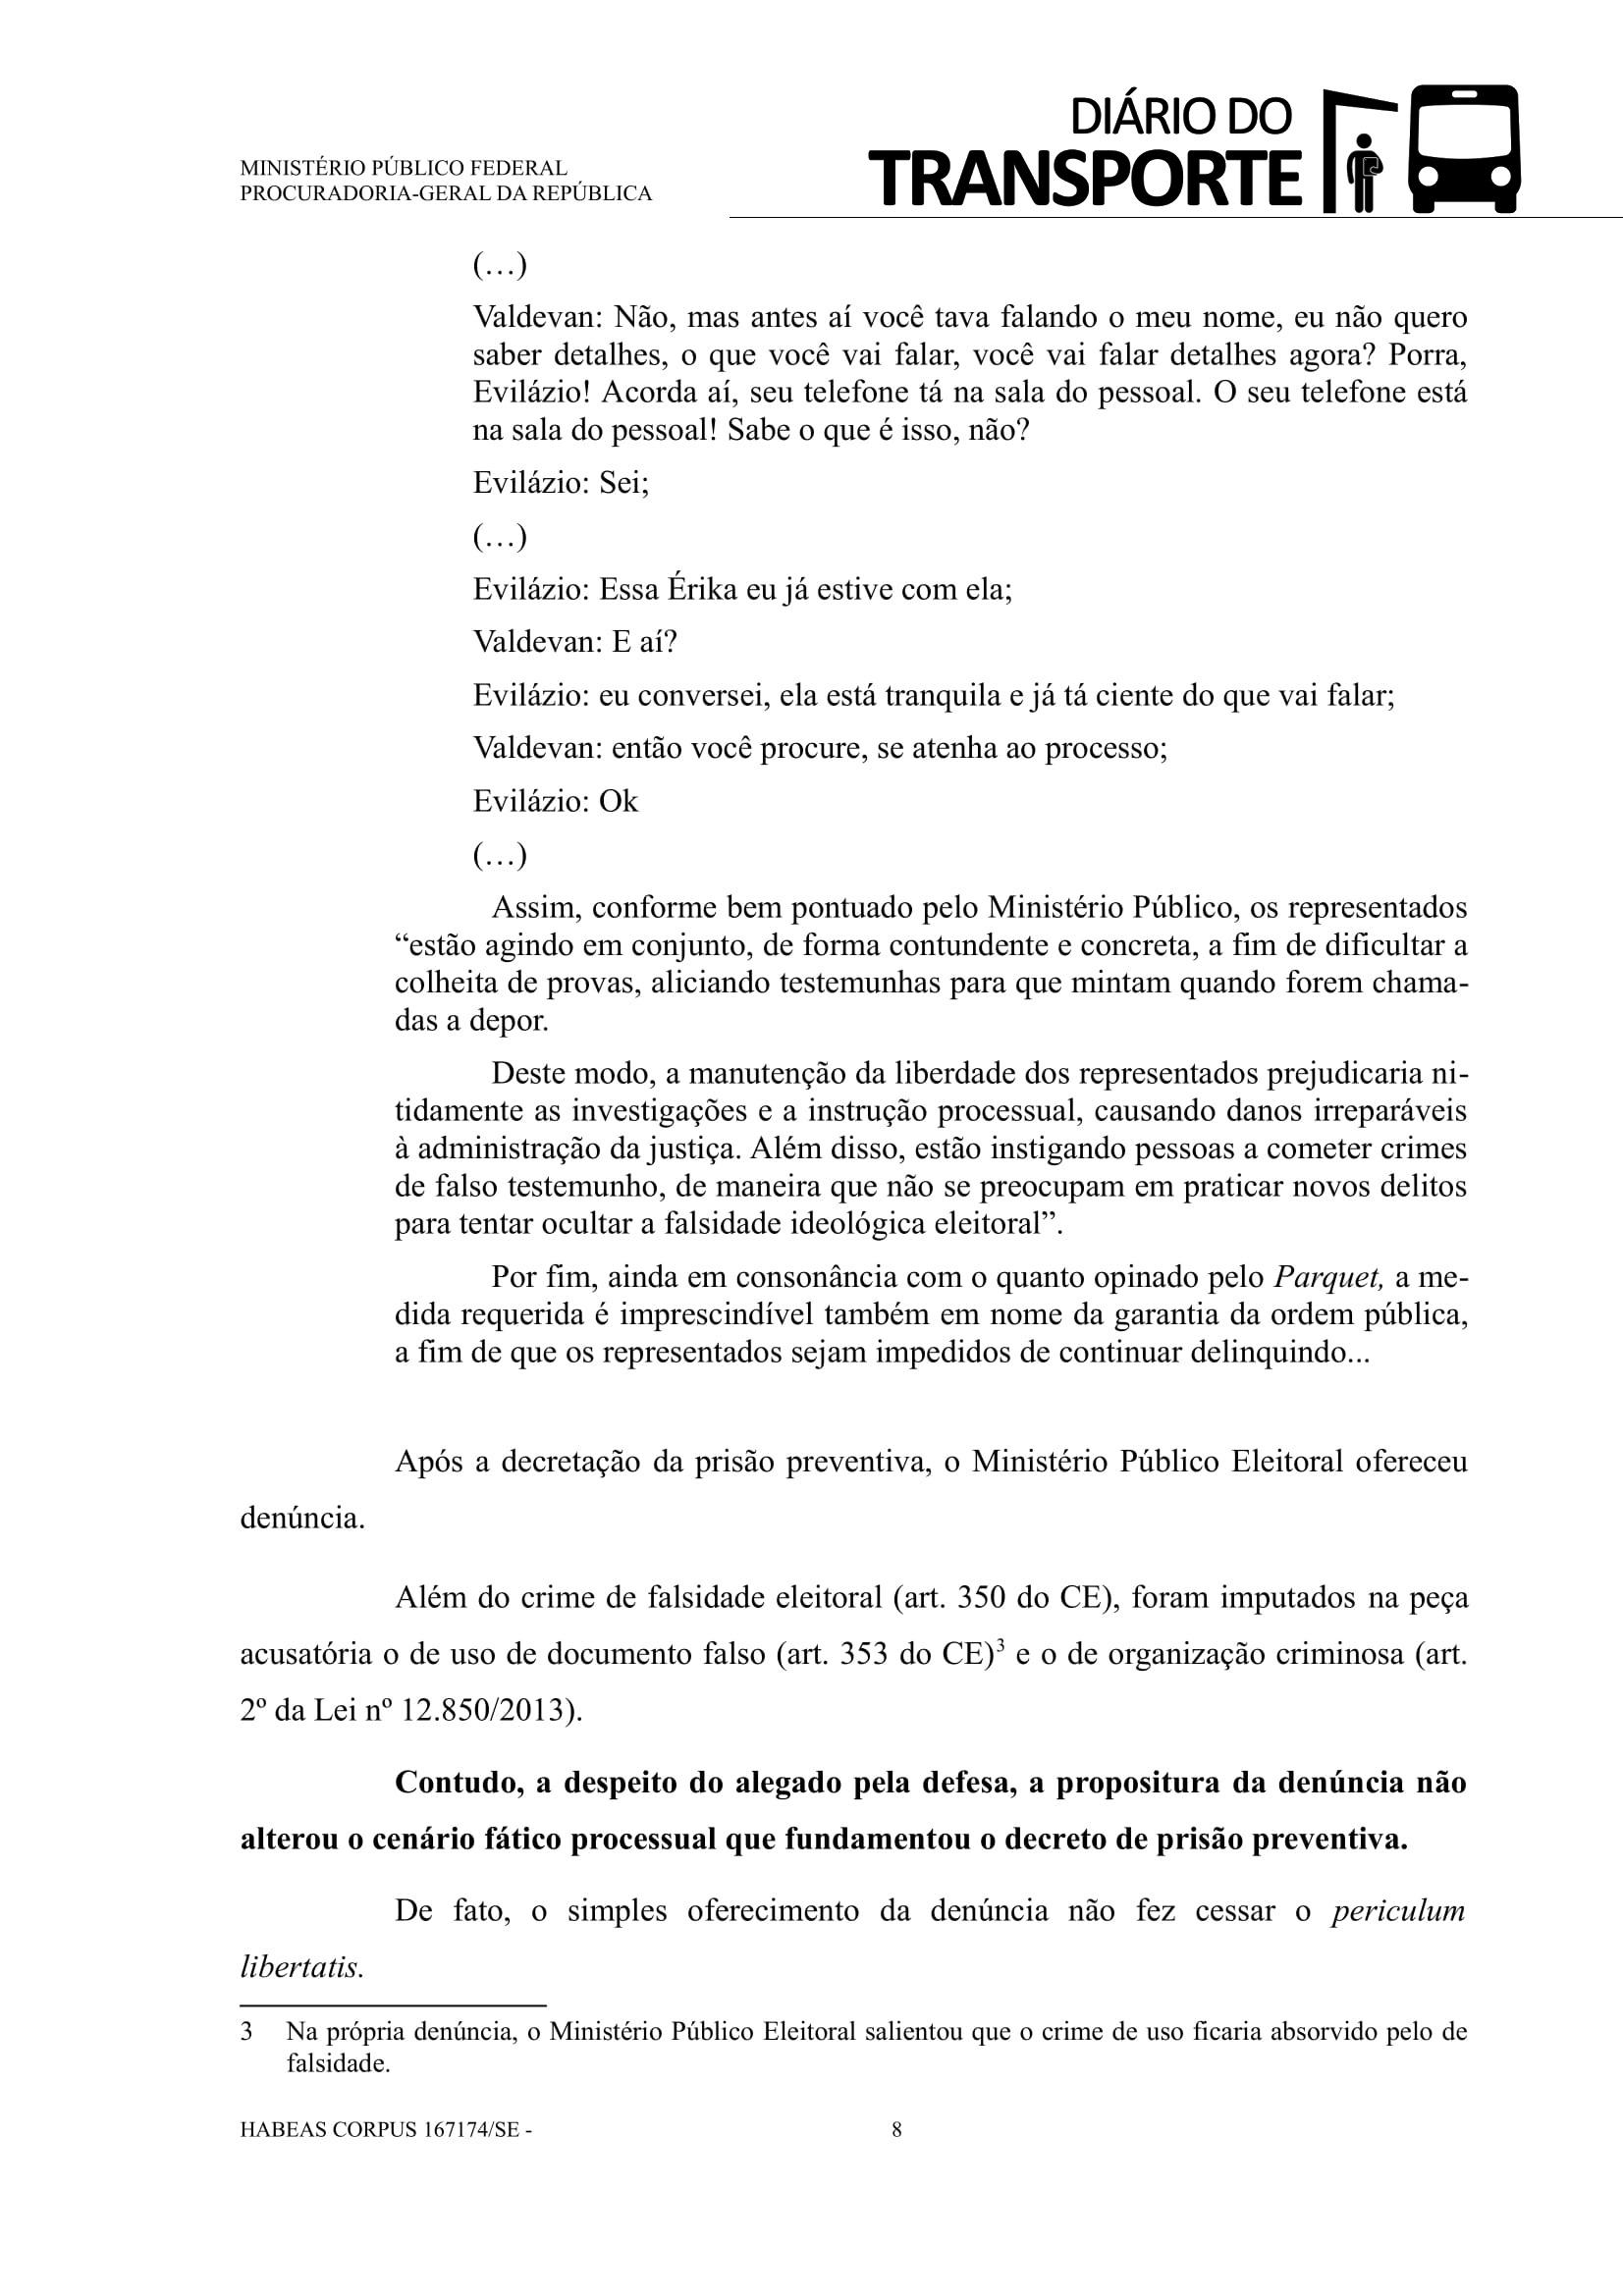 HC 167174_ContrarrazoesAgravo_Jose Valdevan de Jesus Santos-08